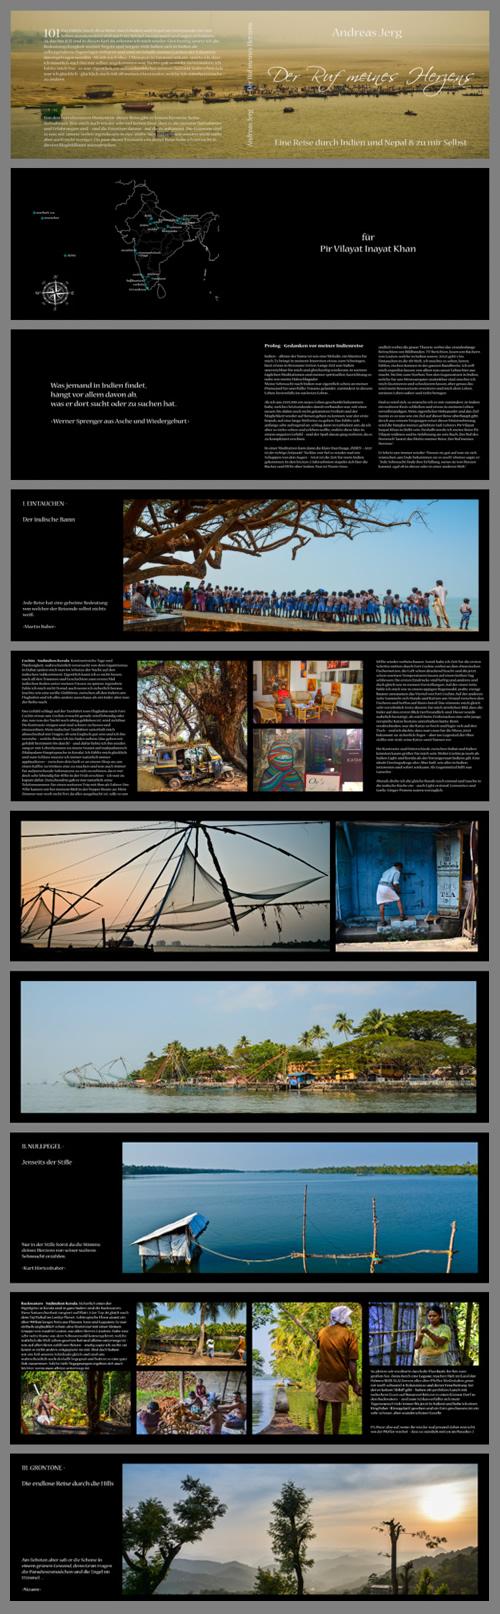 soul-traveller-indien-ebook-der-ruf-meines-herzens